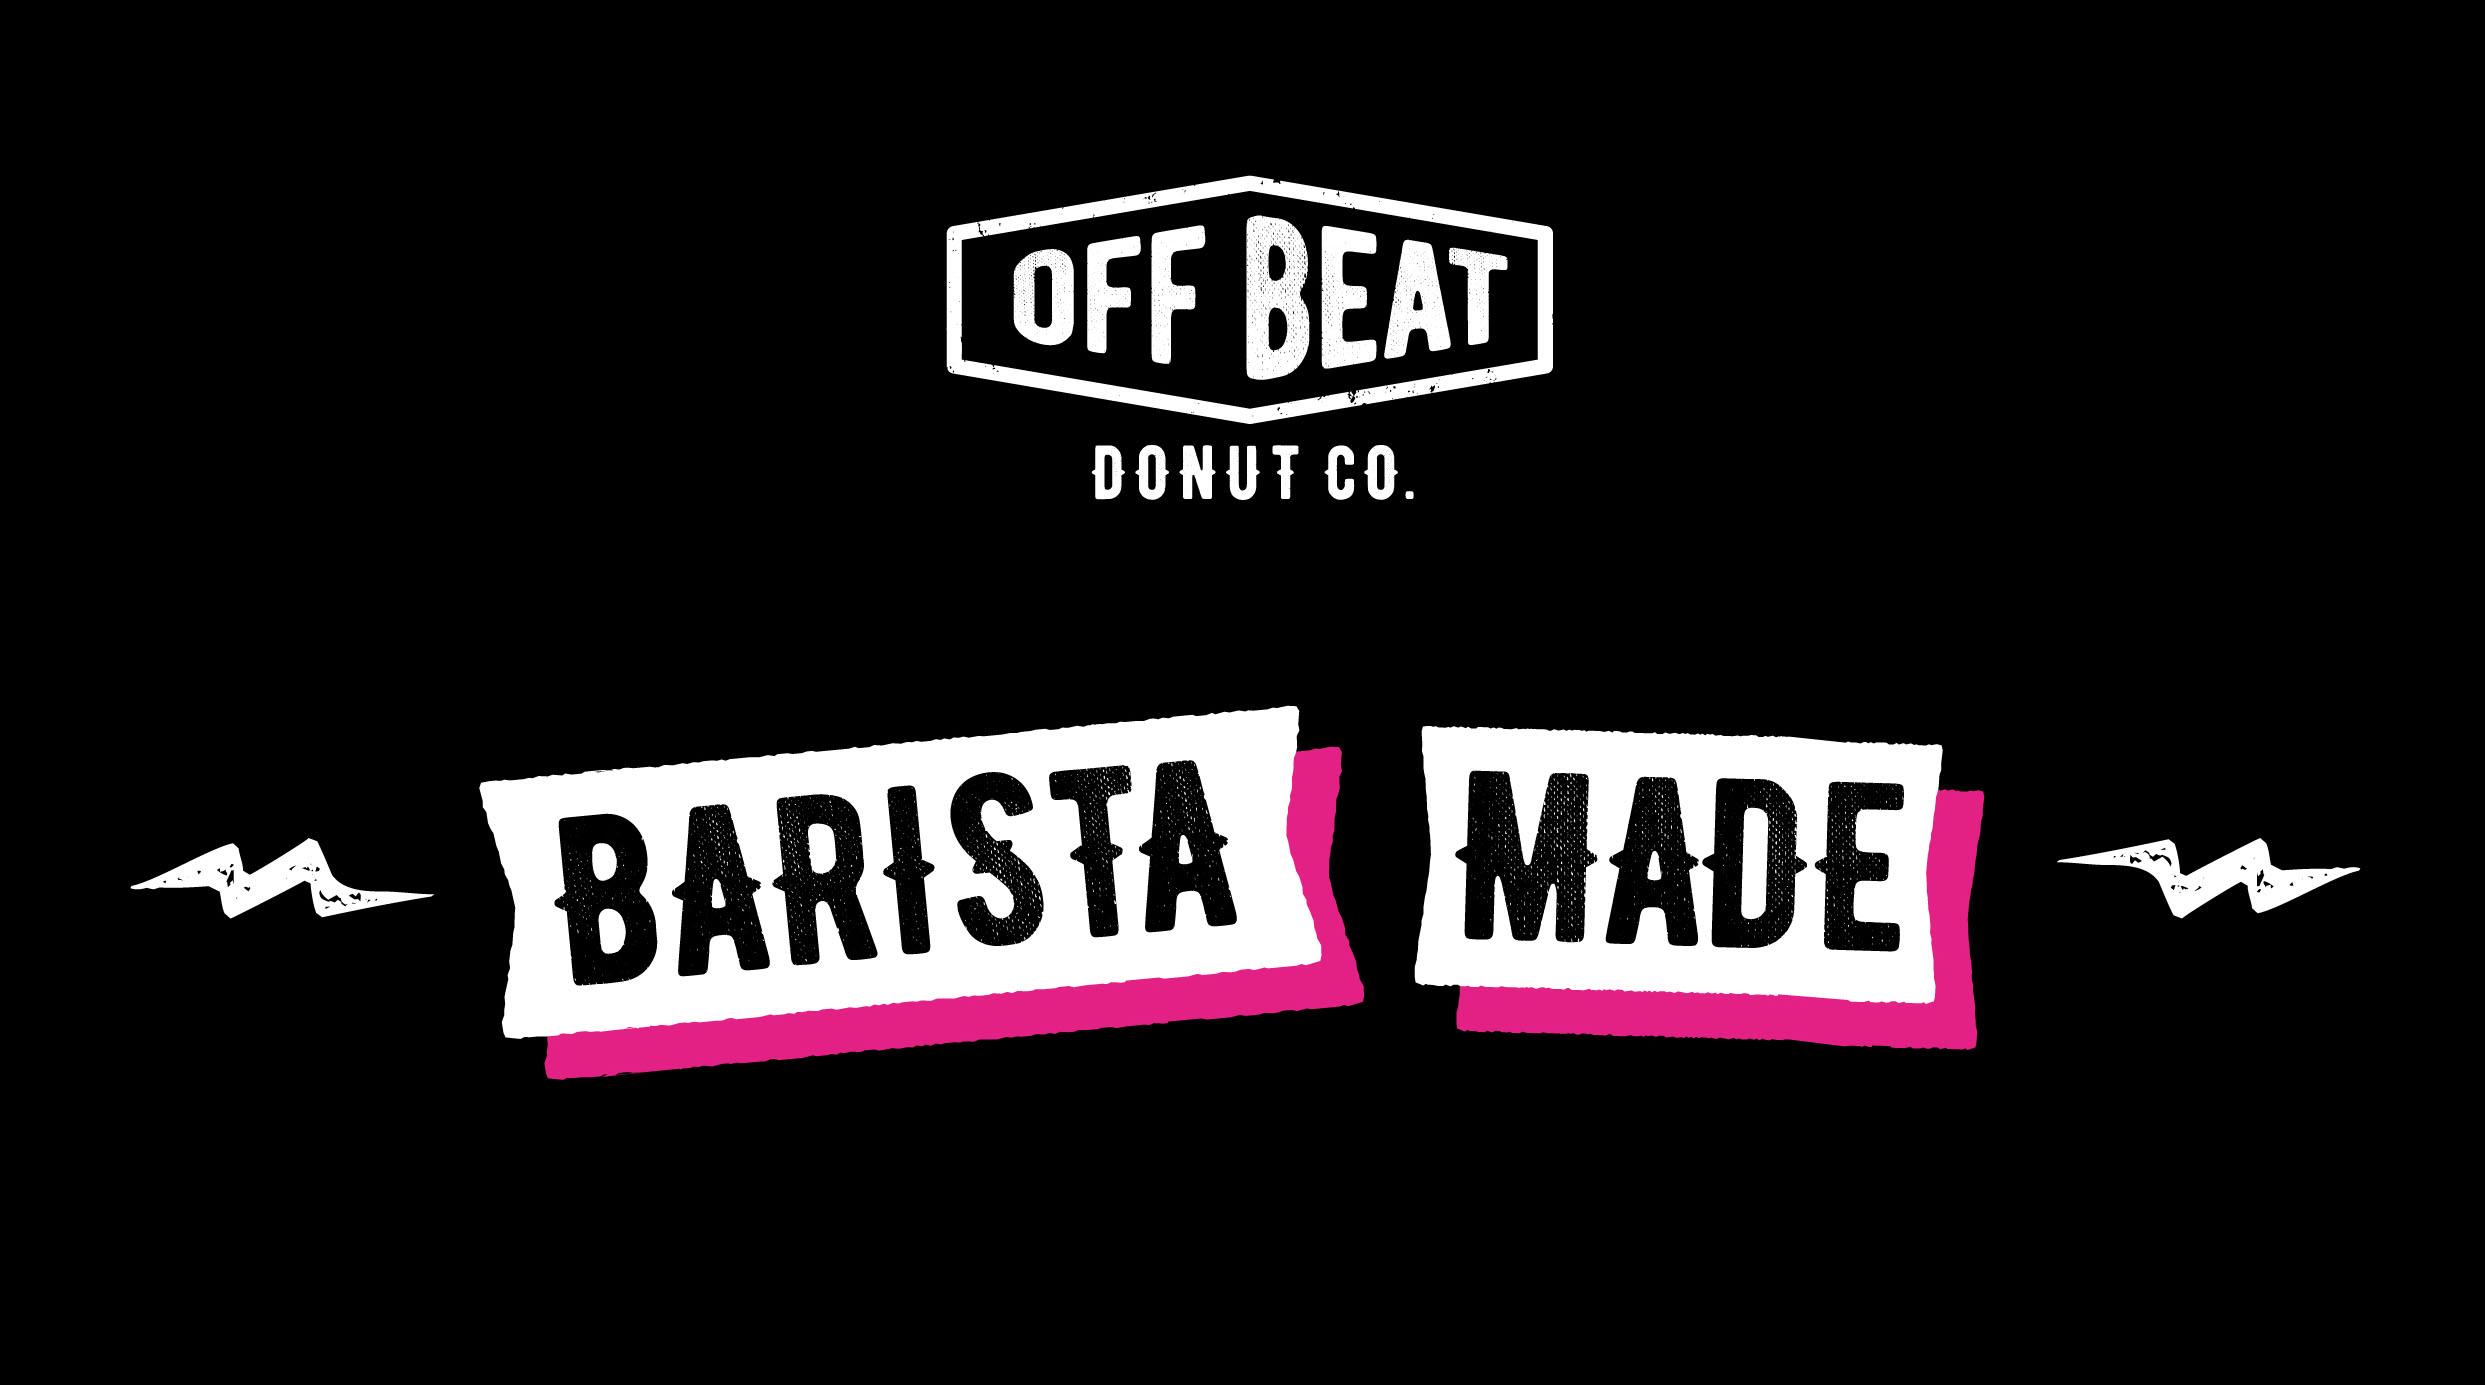 LMPP Offbeat Donuts coffee Barista Made.jpg